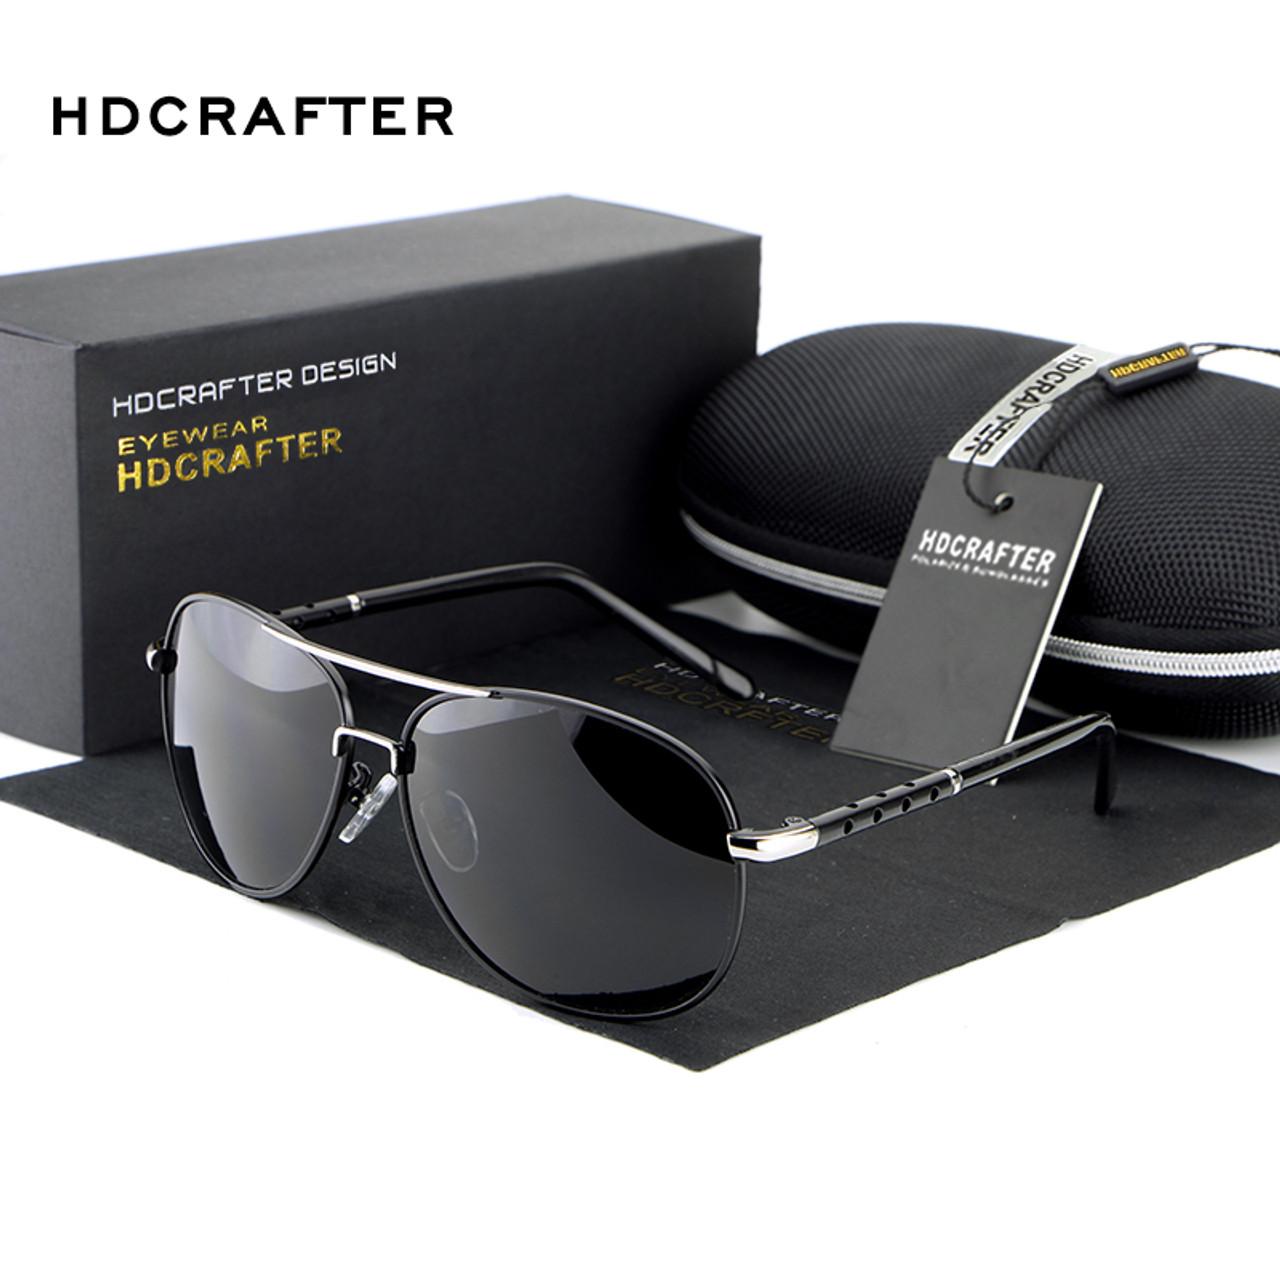 32a8ad653be ... HDCRAFTER Men Polarized Aviator Sunglasses New brand designer Aluminum  Magnesium Driving Male Fashion Sunglasses 2018 ...